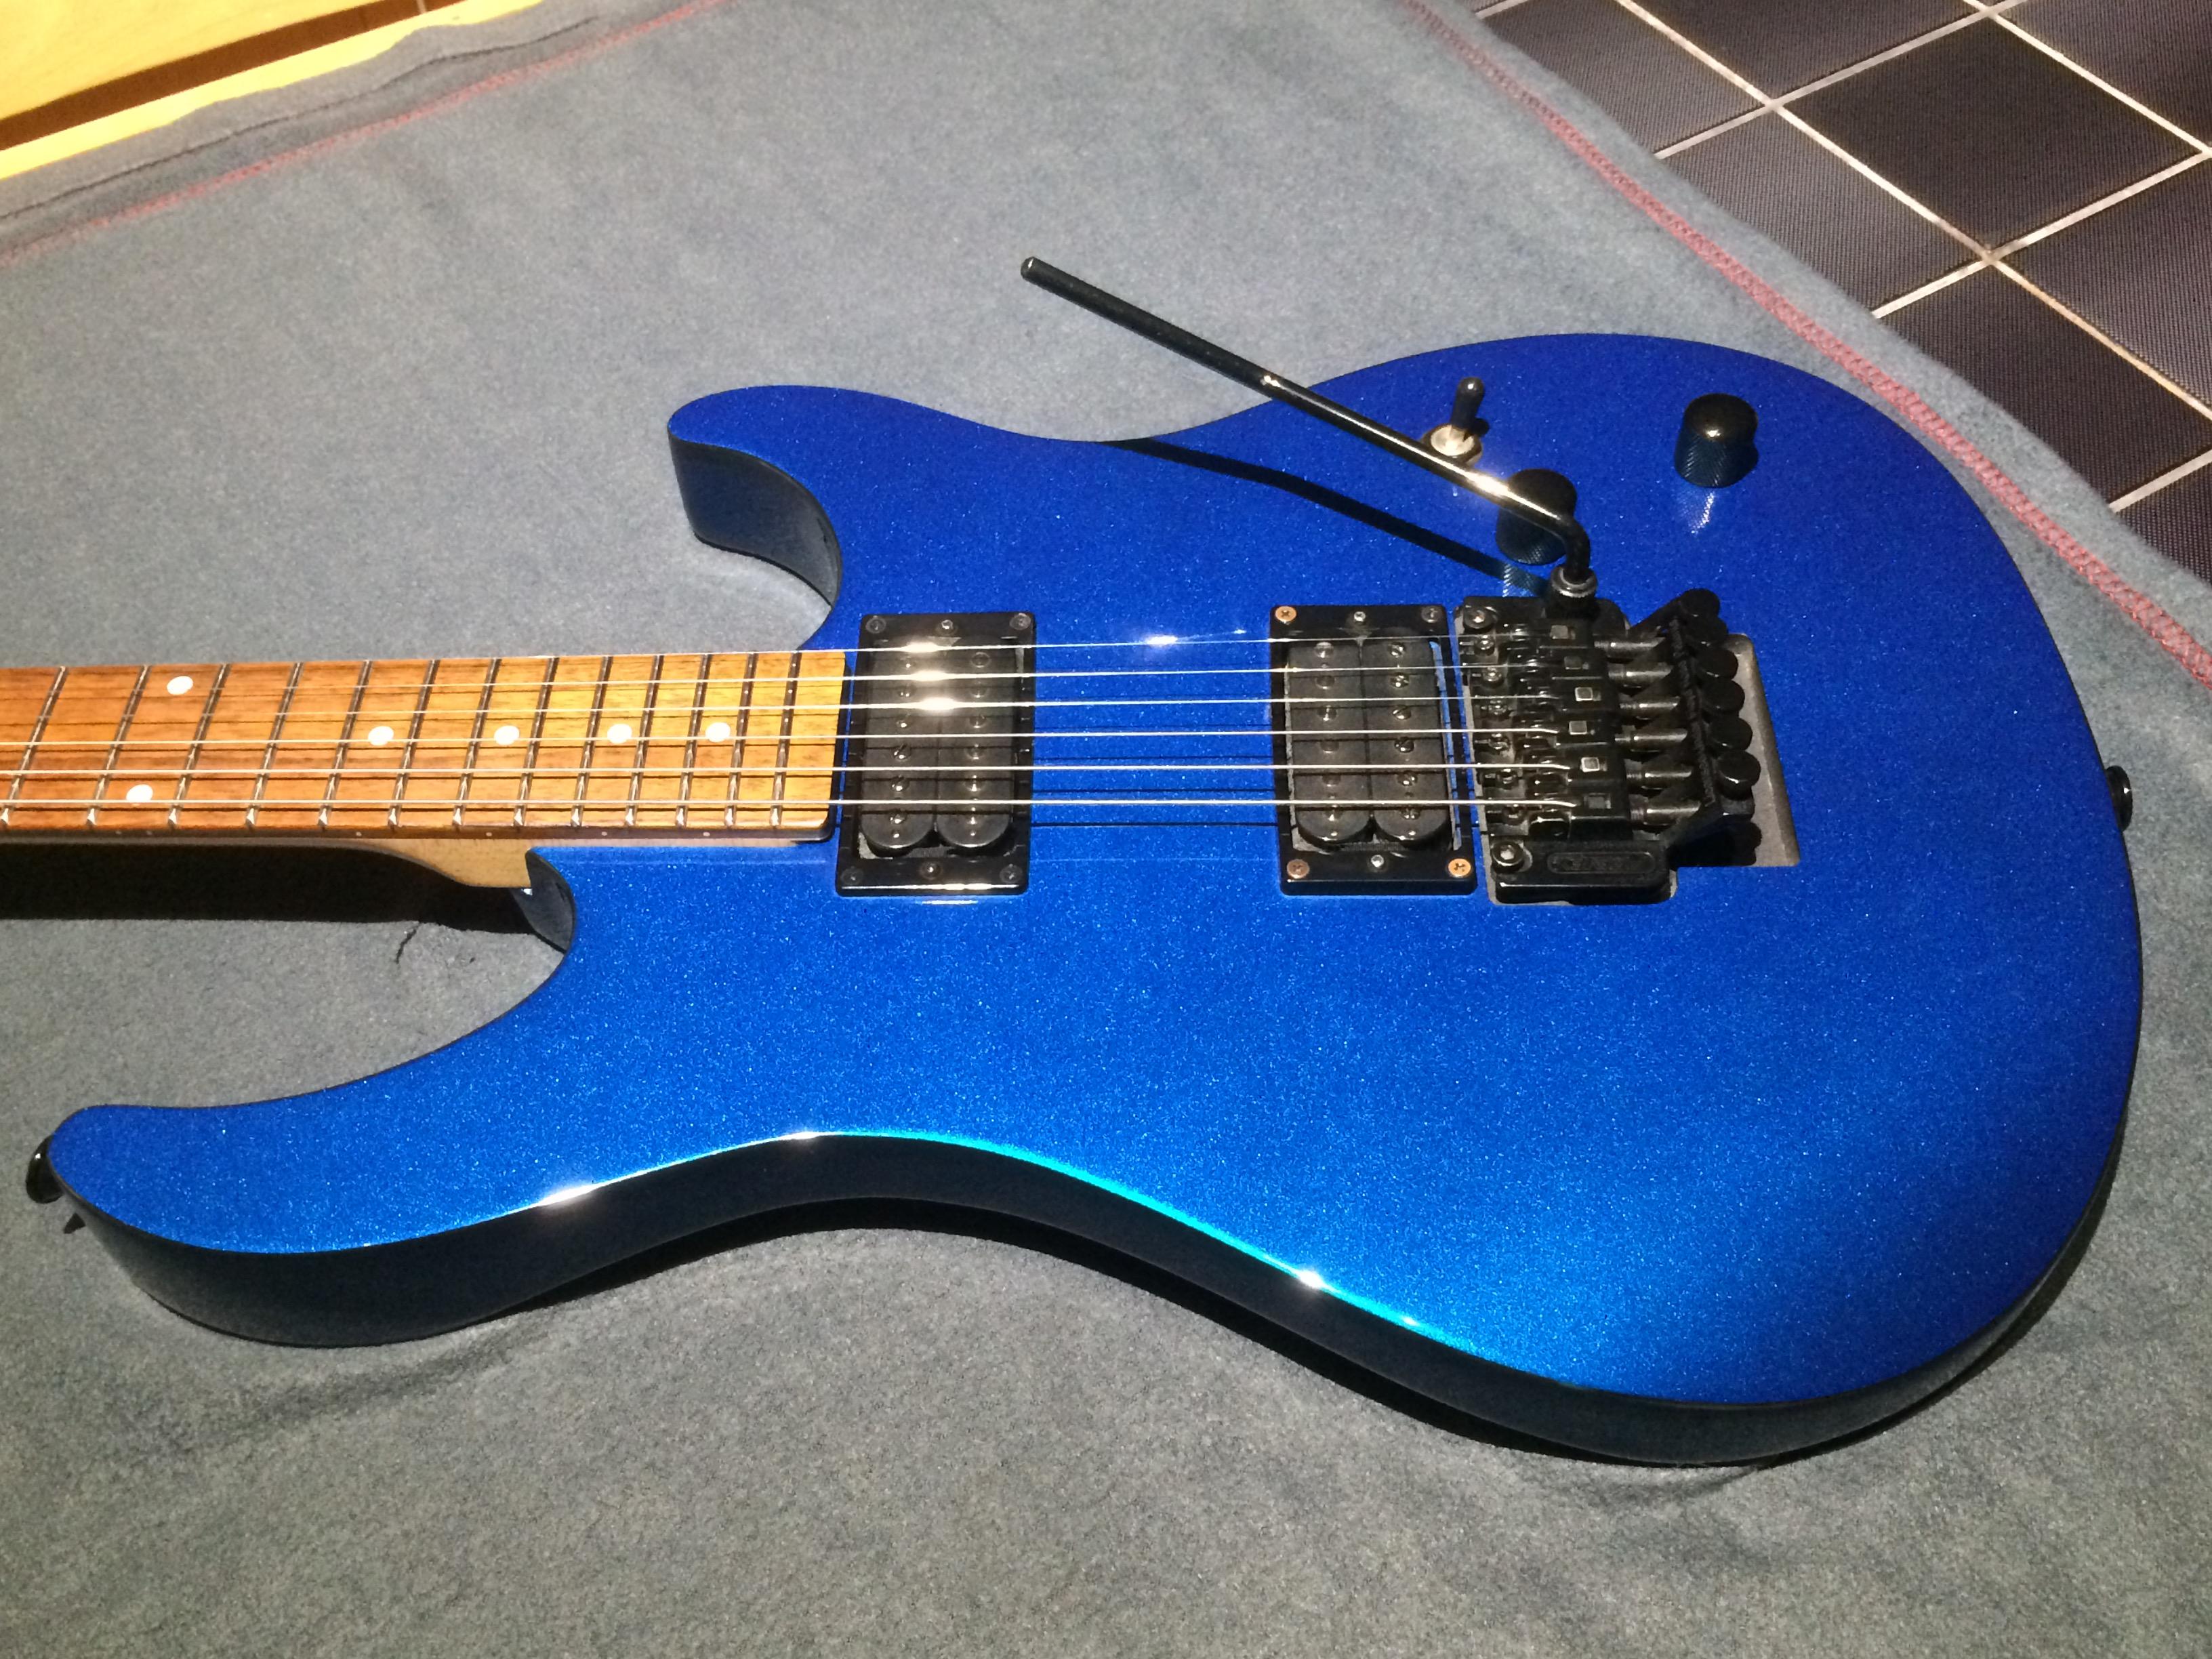 Wiring Diagram For Peavey Guitar Sc1stpremier Wolfgang Pickup Bass Raptor 1